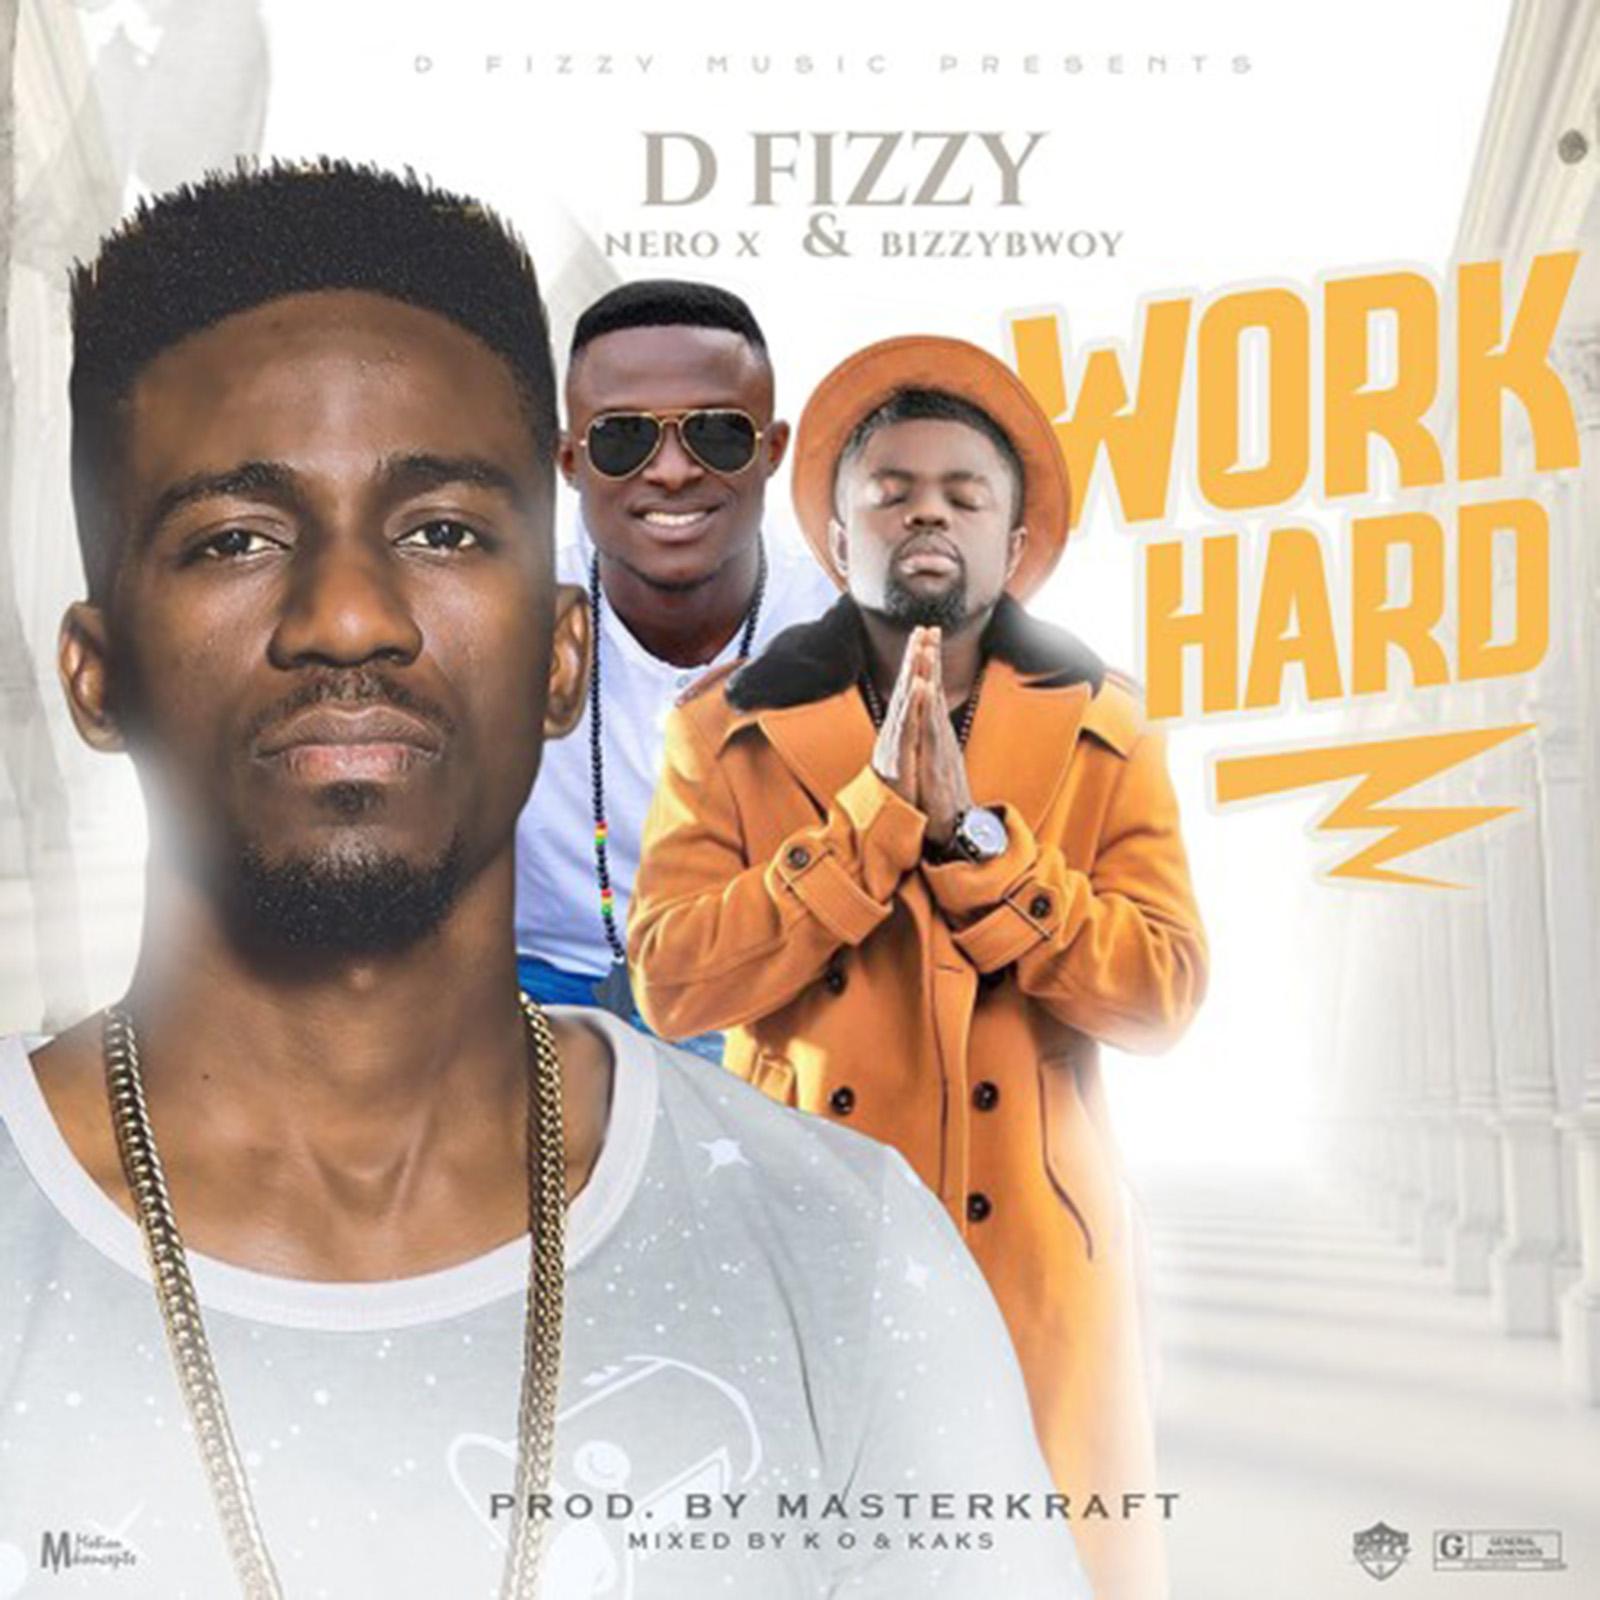 Work Hard by D.fizzy feat. Nero X & Bizzy Boy